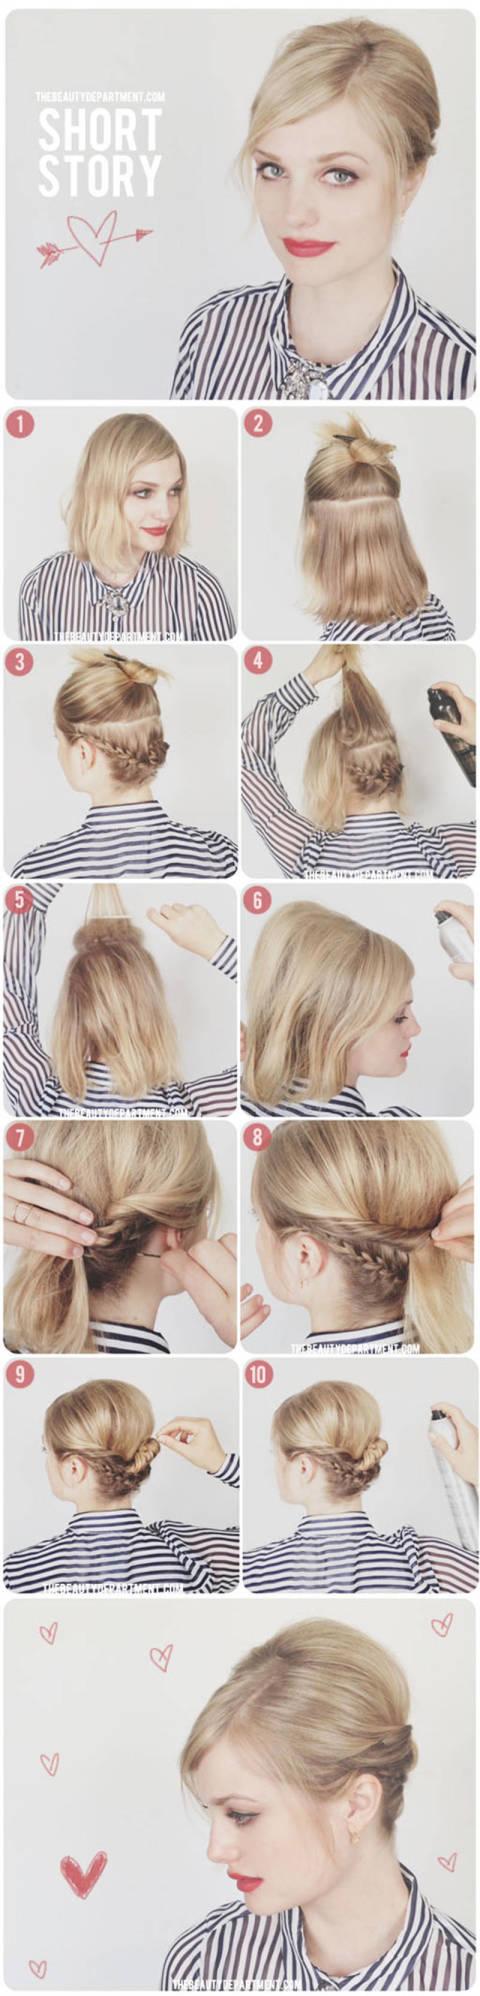 Peachy 8 Lovely Short Medium Hair Tutorials You Should Steal From Pinterest Short Hairstyles Gunalazisus